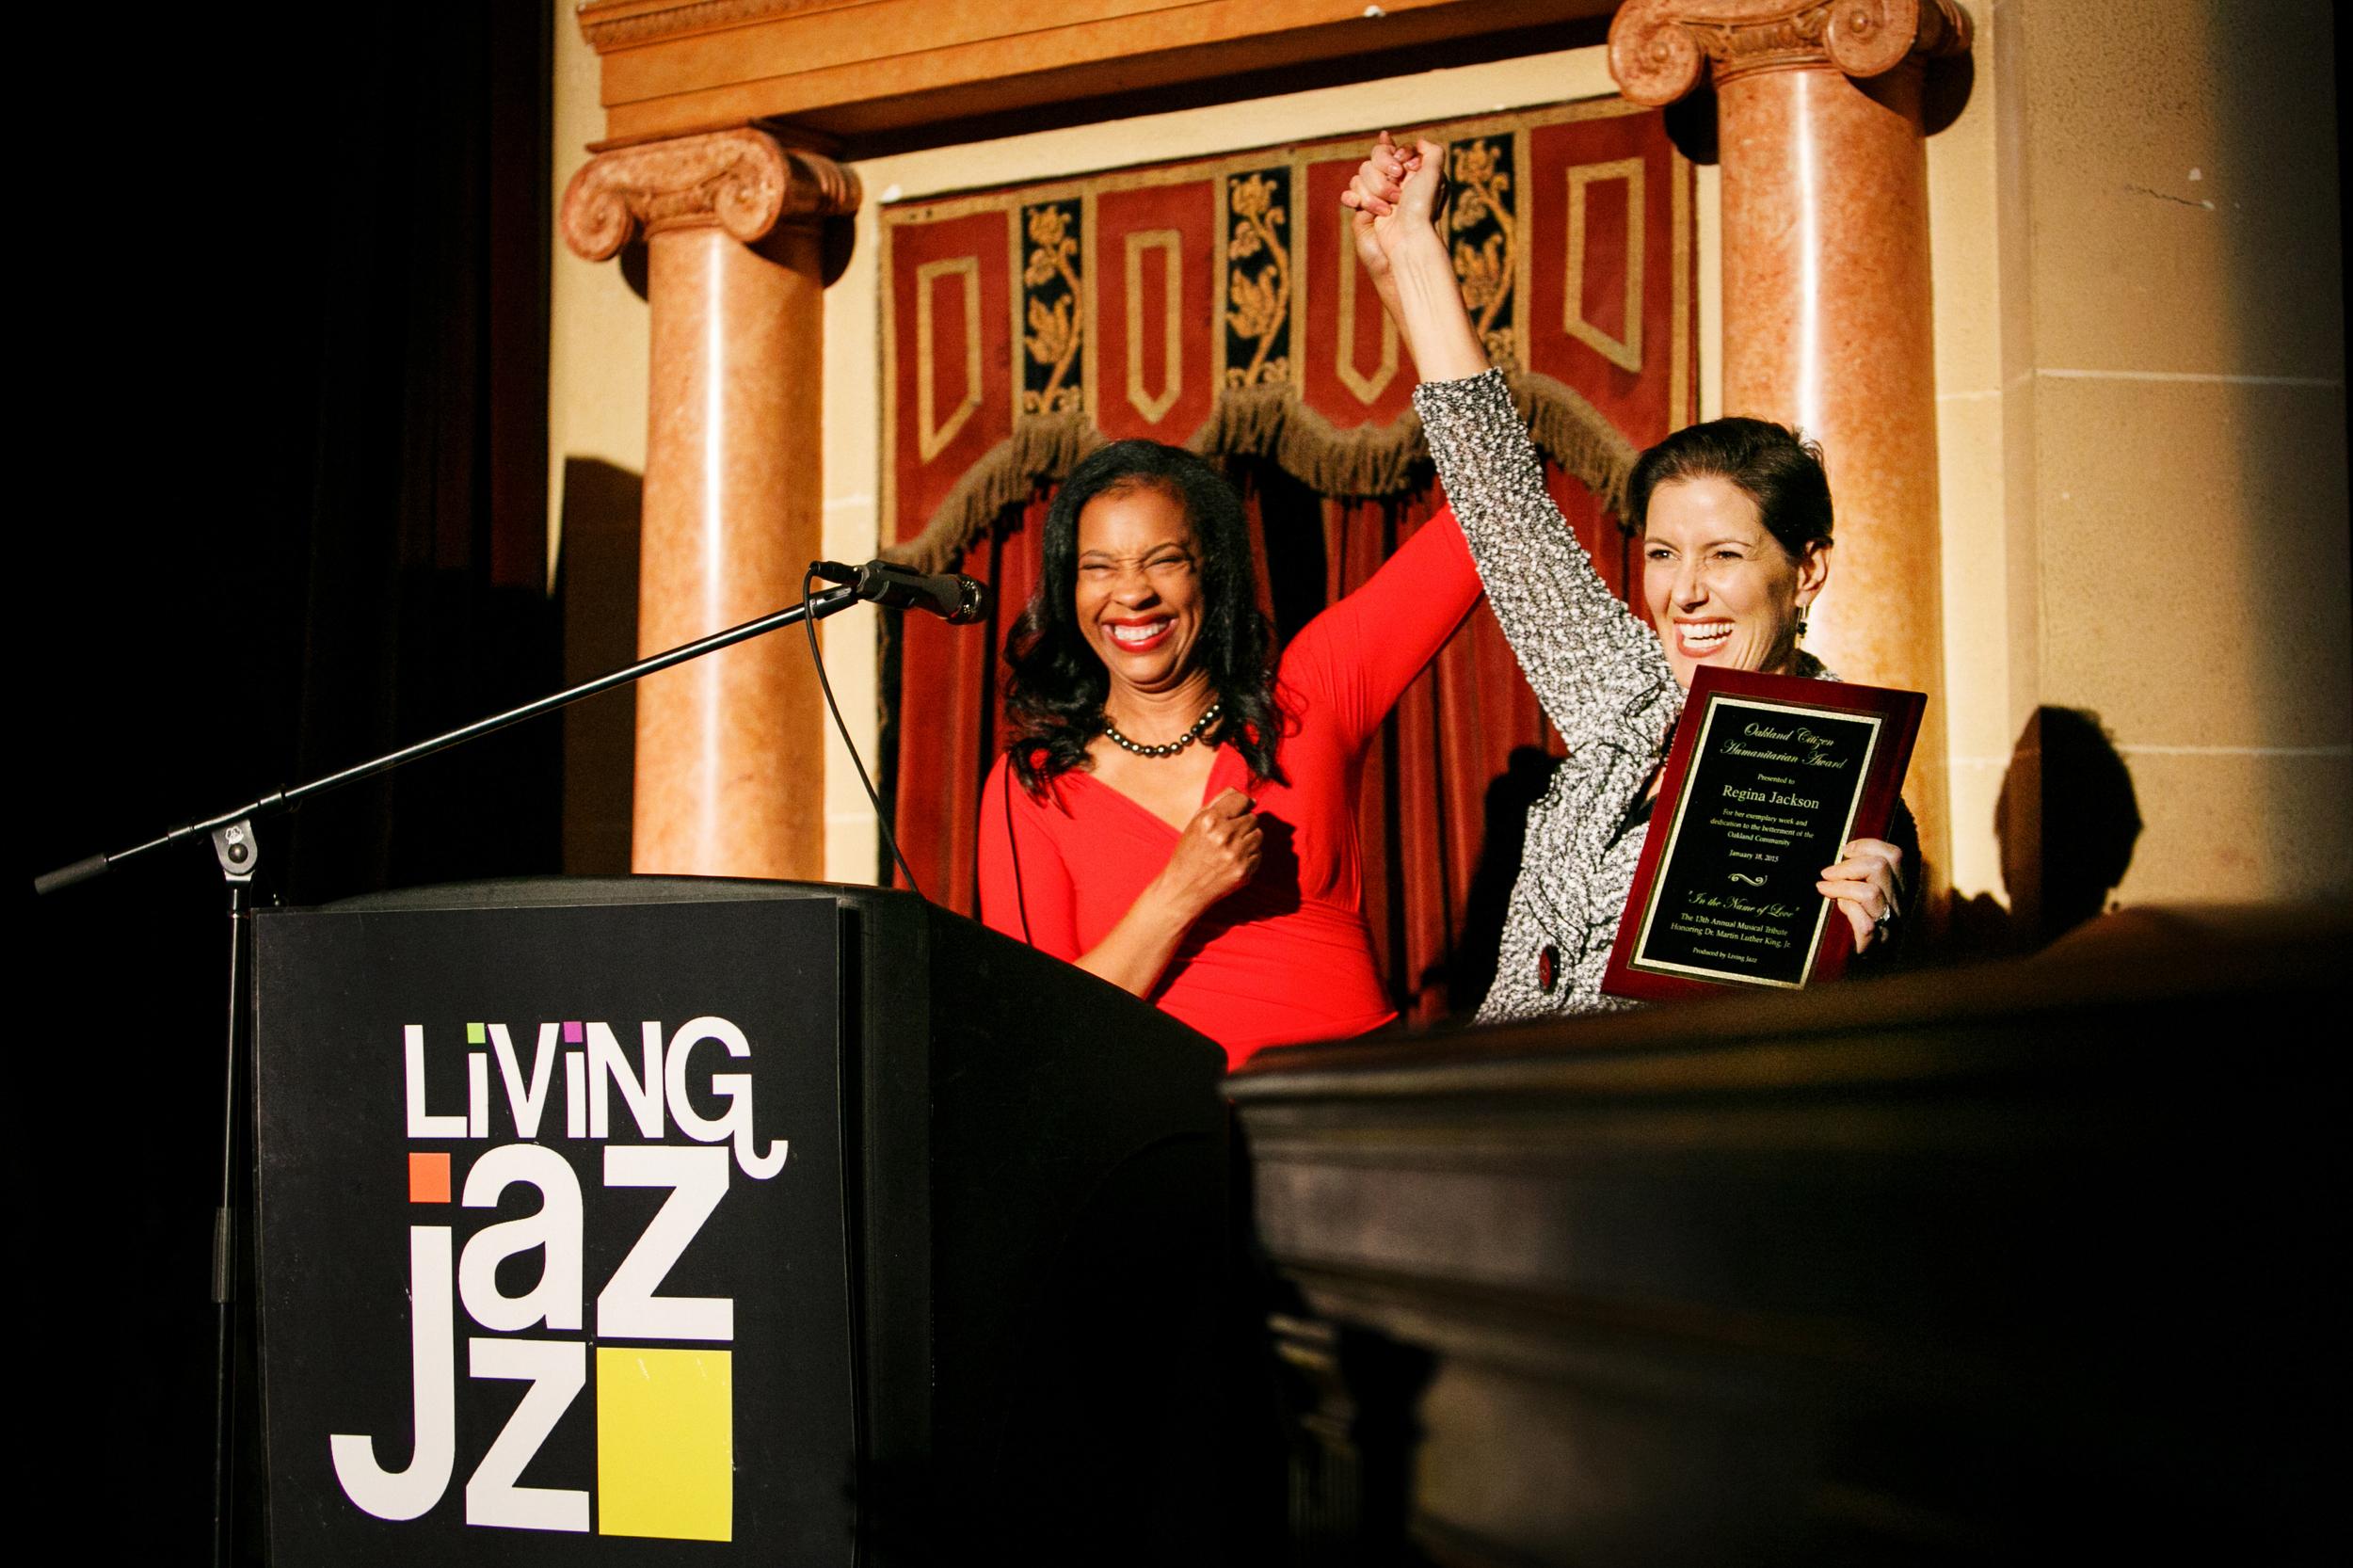 2015-living-jazz-mlk-tribute-by-rosaura-sandoval-0725.jpg